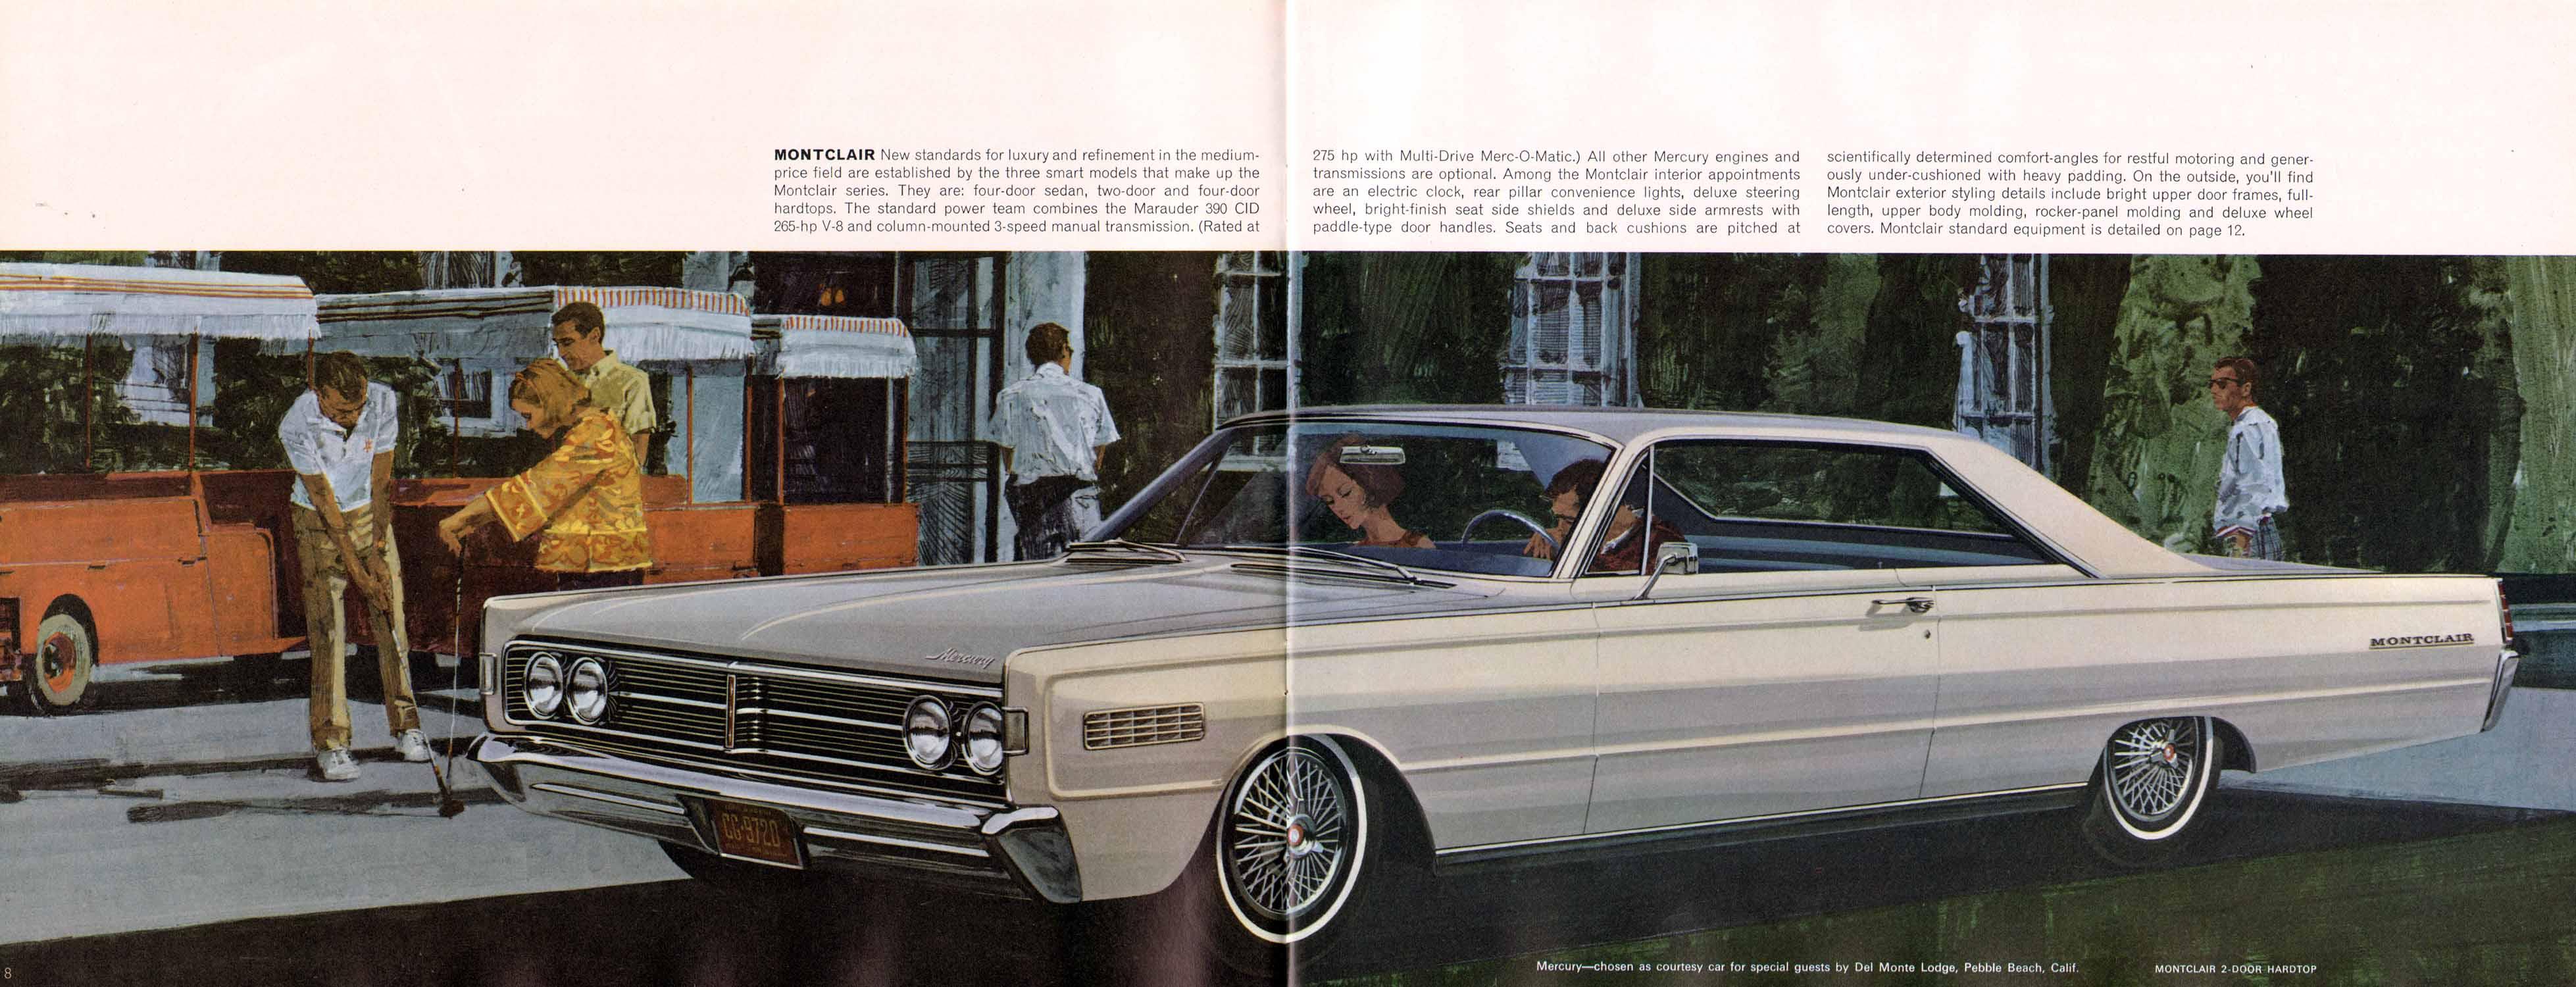 Directory Index: Mercury/1966_Mercury/1966_Mercury_Full_Size_Brochure